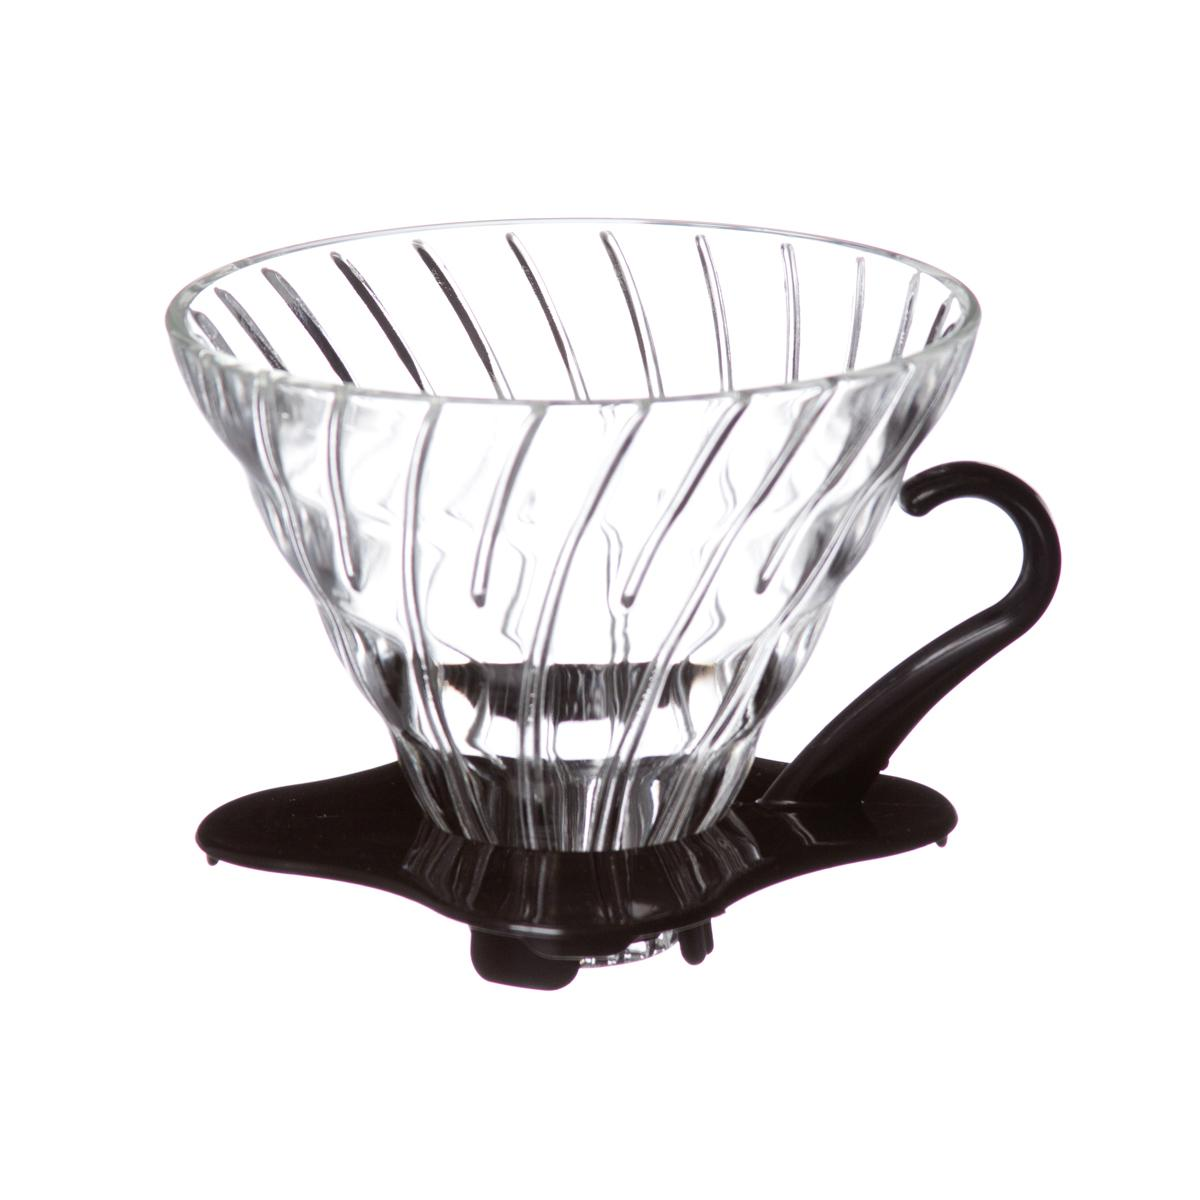 Hario V60 Glass Dripper ถ้วยแก้วใส สำหรับ ดริปกาแฟ ขนาด 01